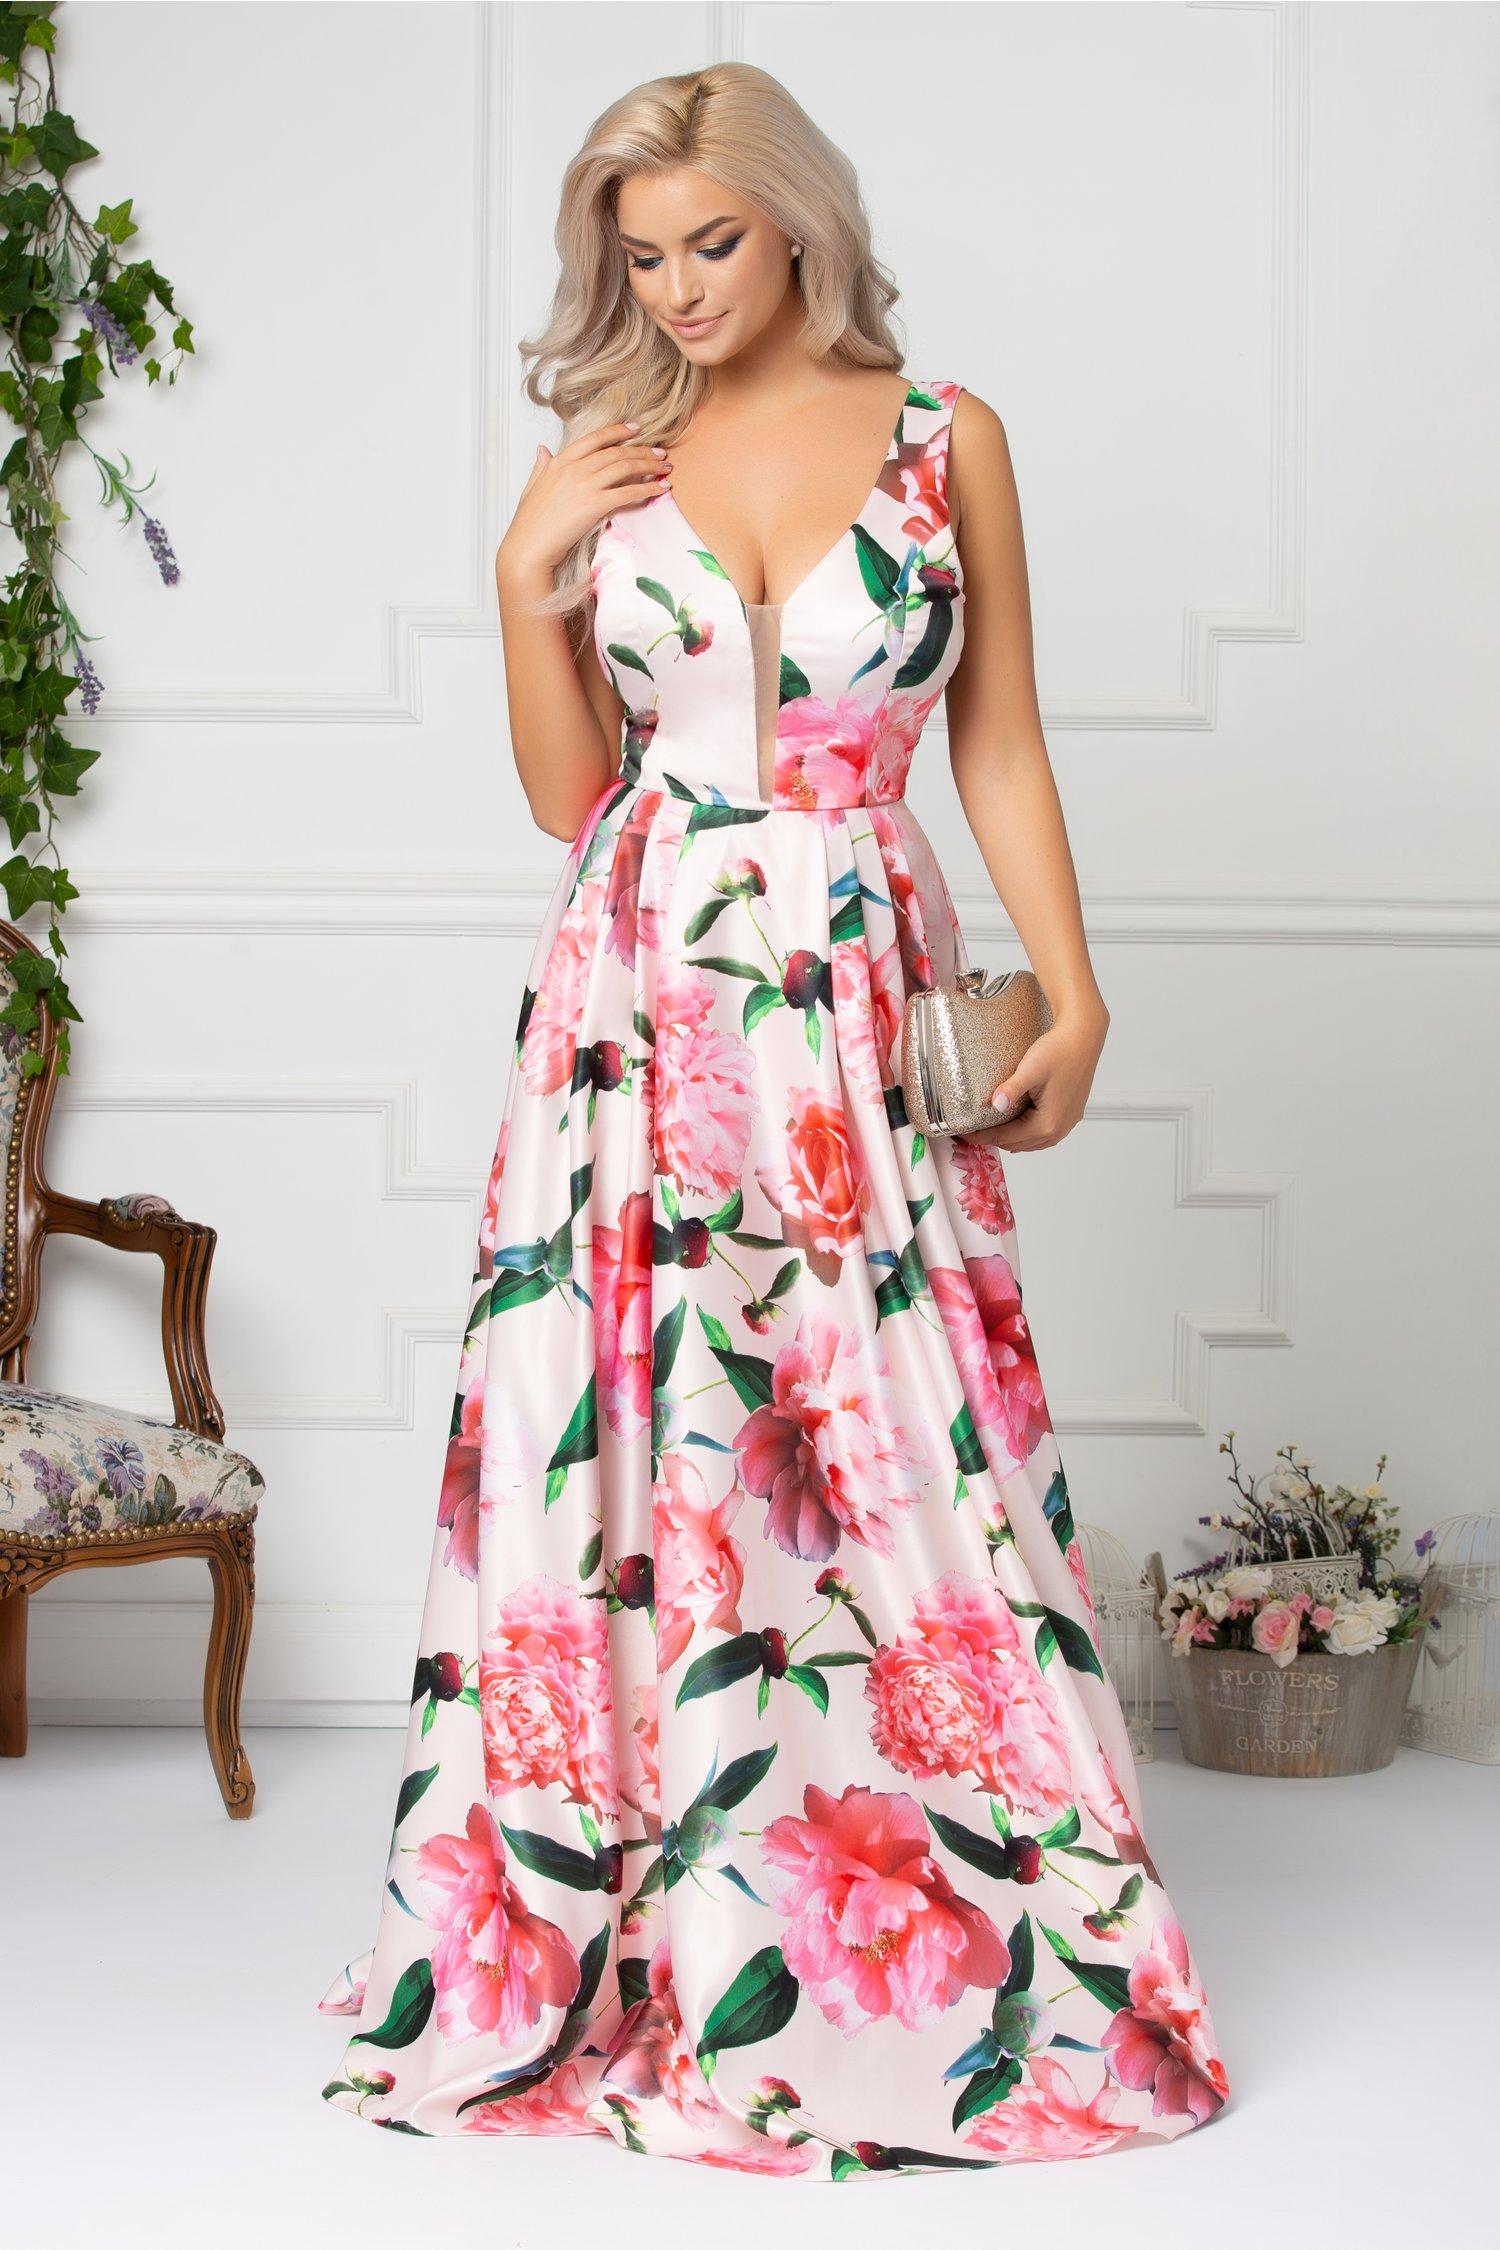 Rochie Artista Tina lunga roz pal cu imprimeu floral